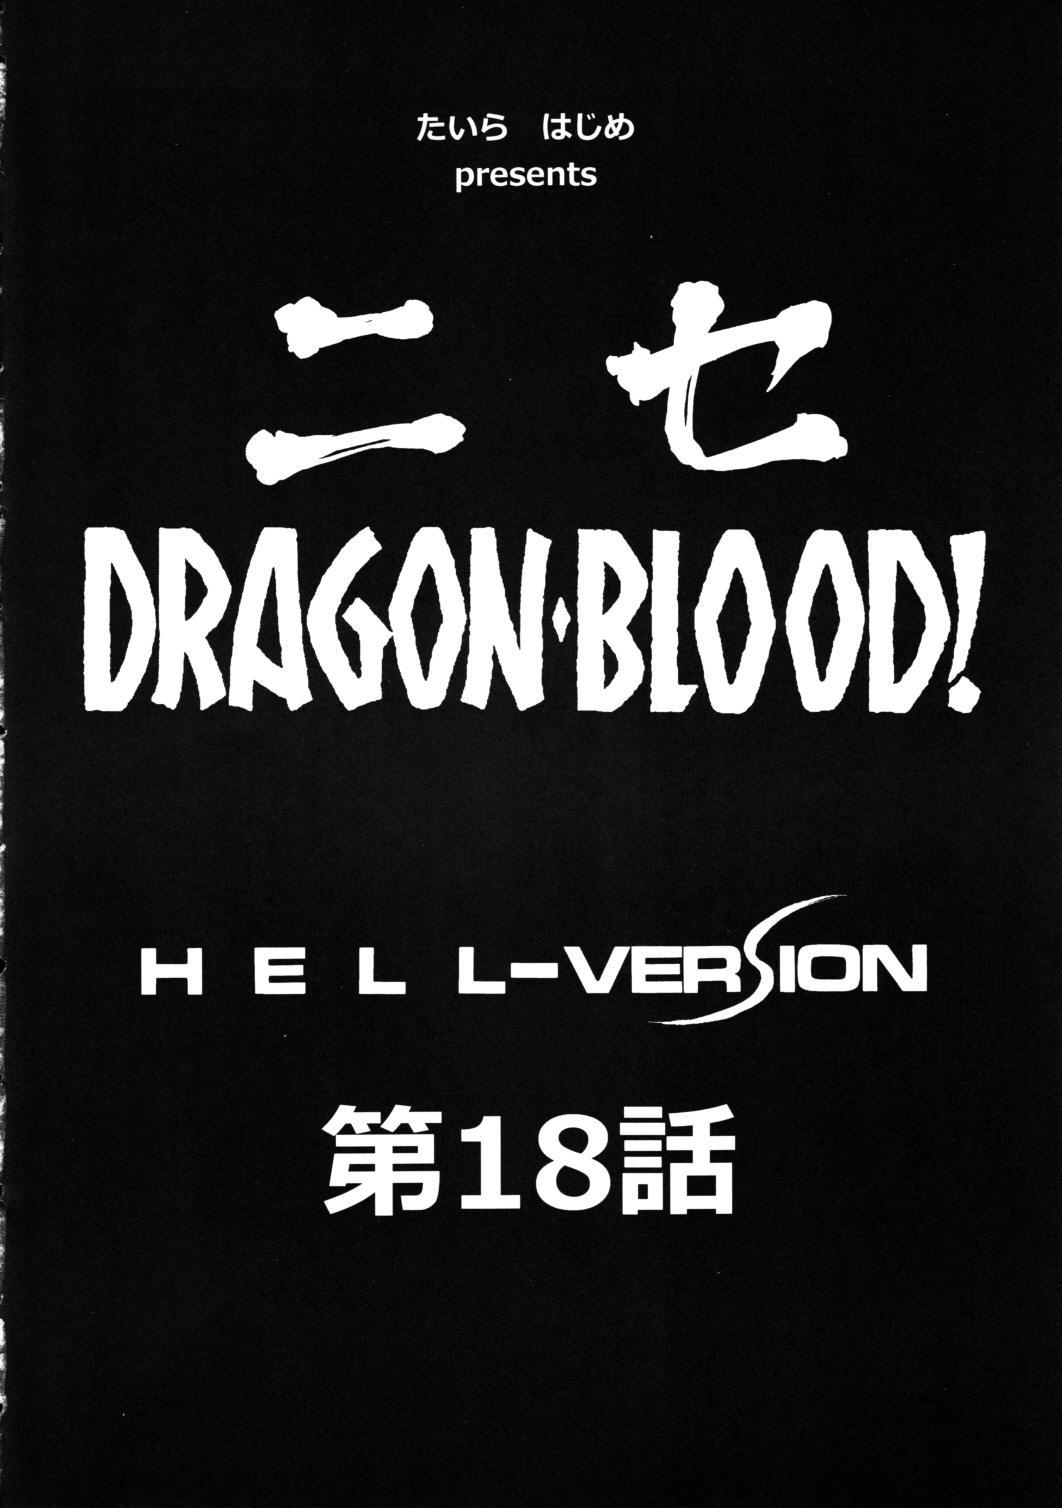 Nise Dragon Blood! 18 9